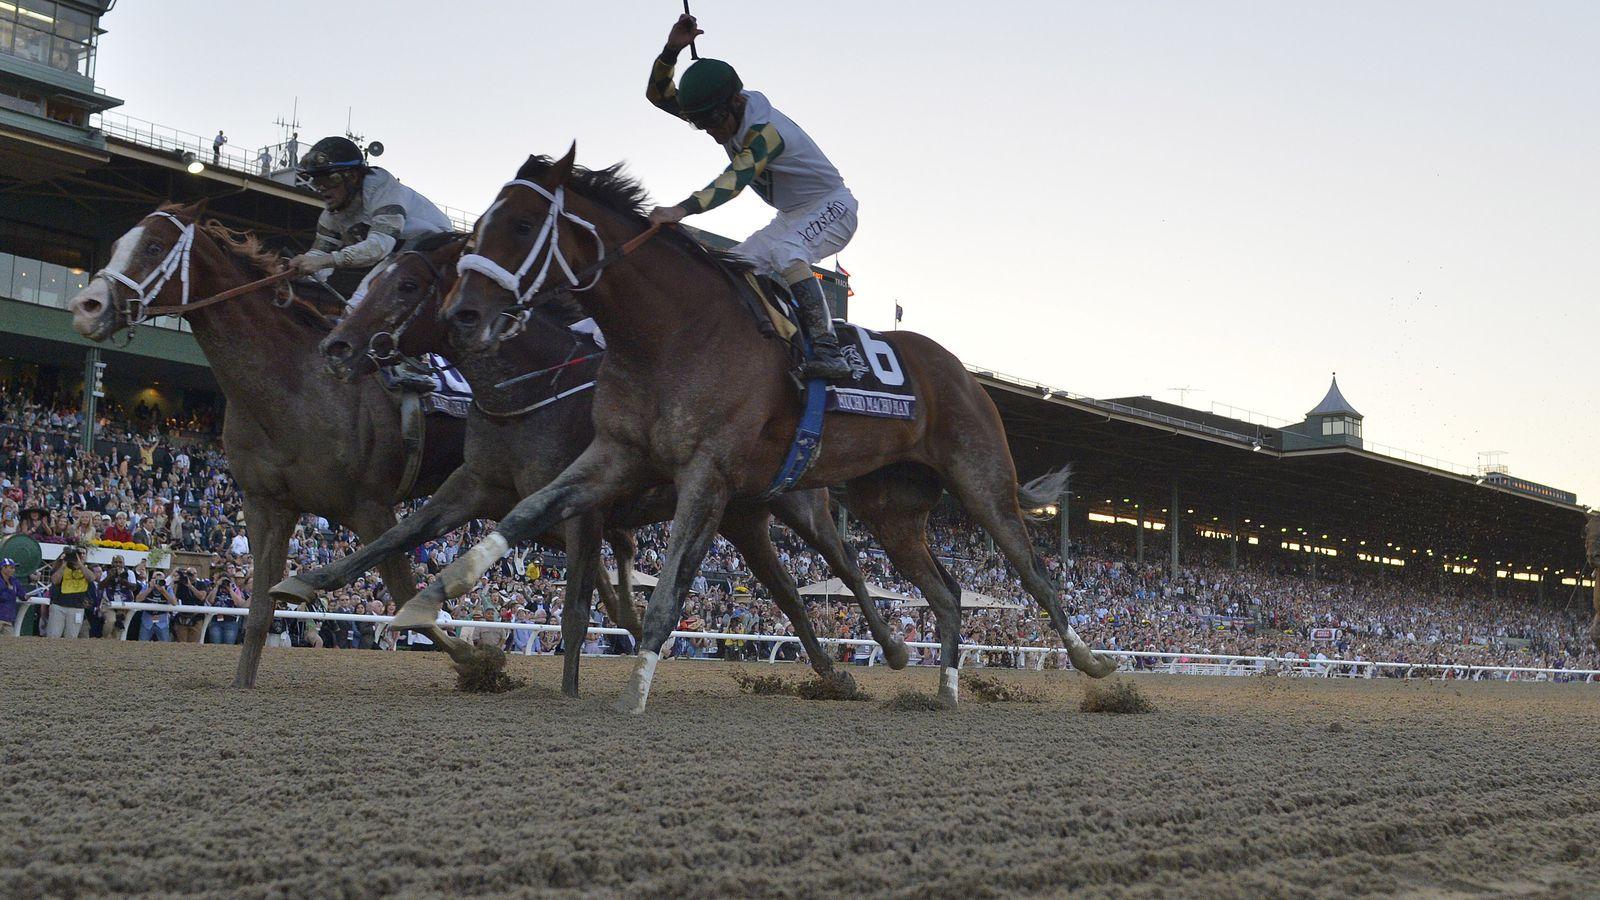 2014 Santa Anita Handicap A Rematch In Arcadia And Down